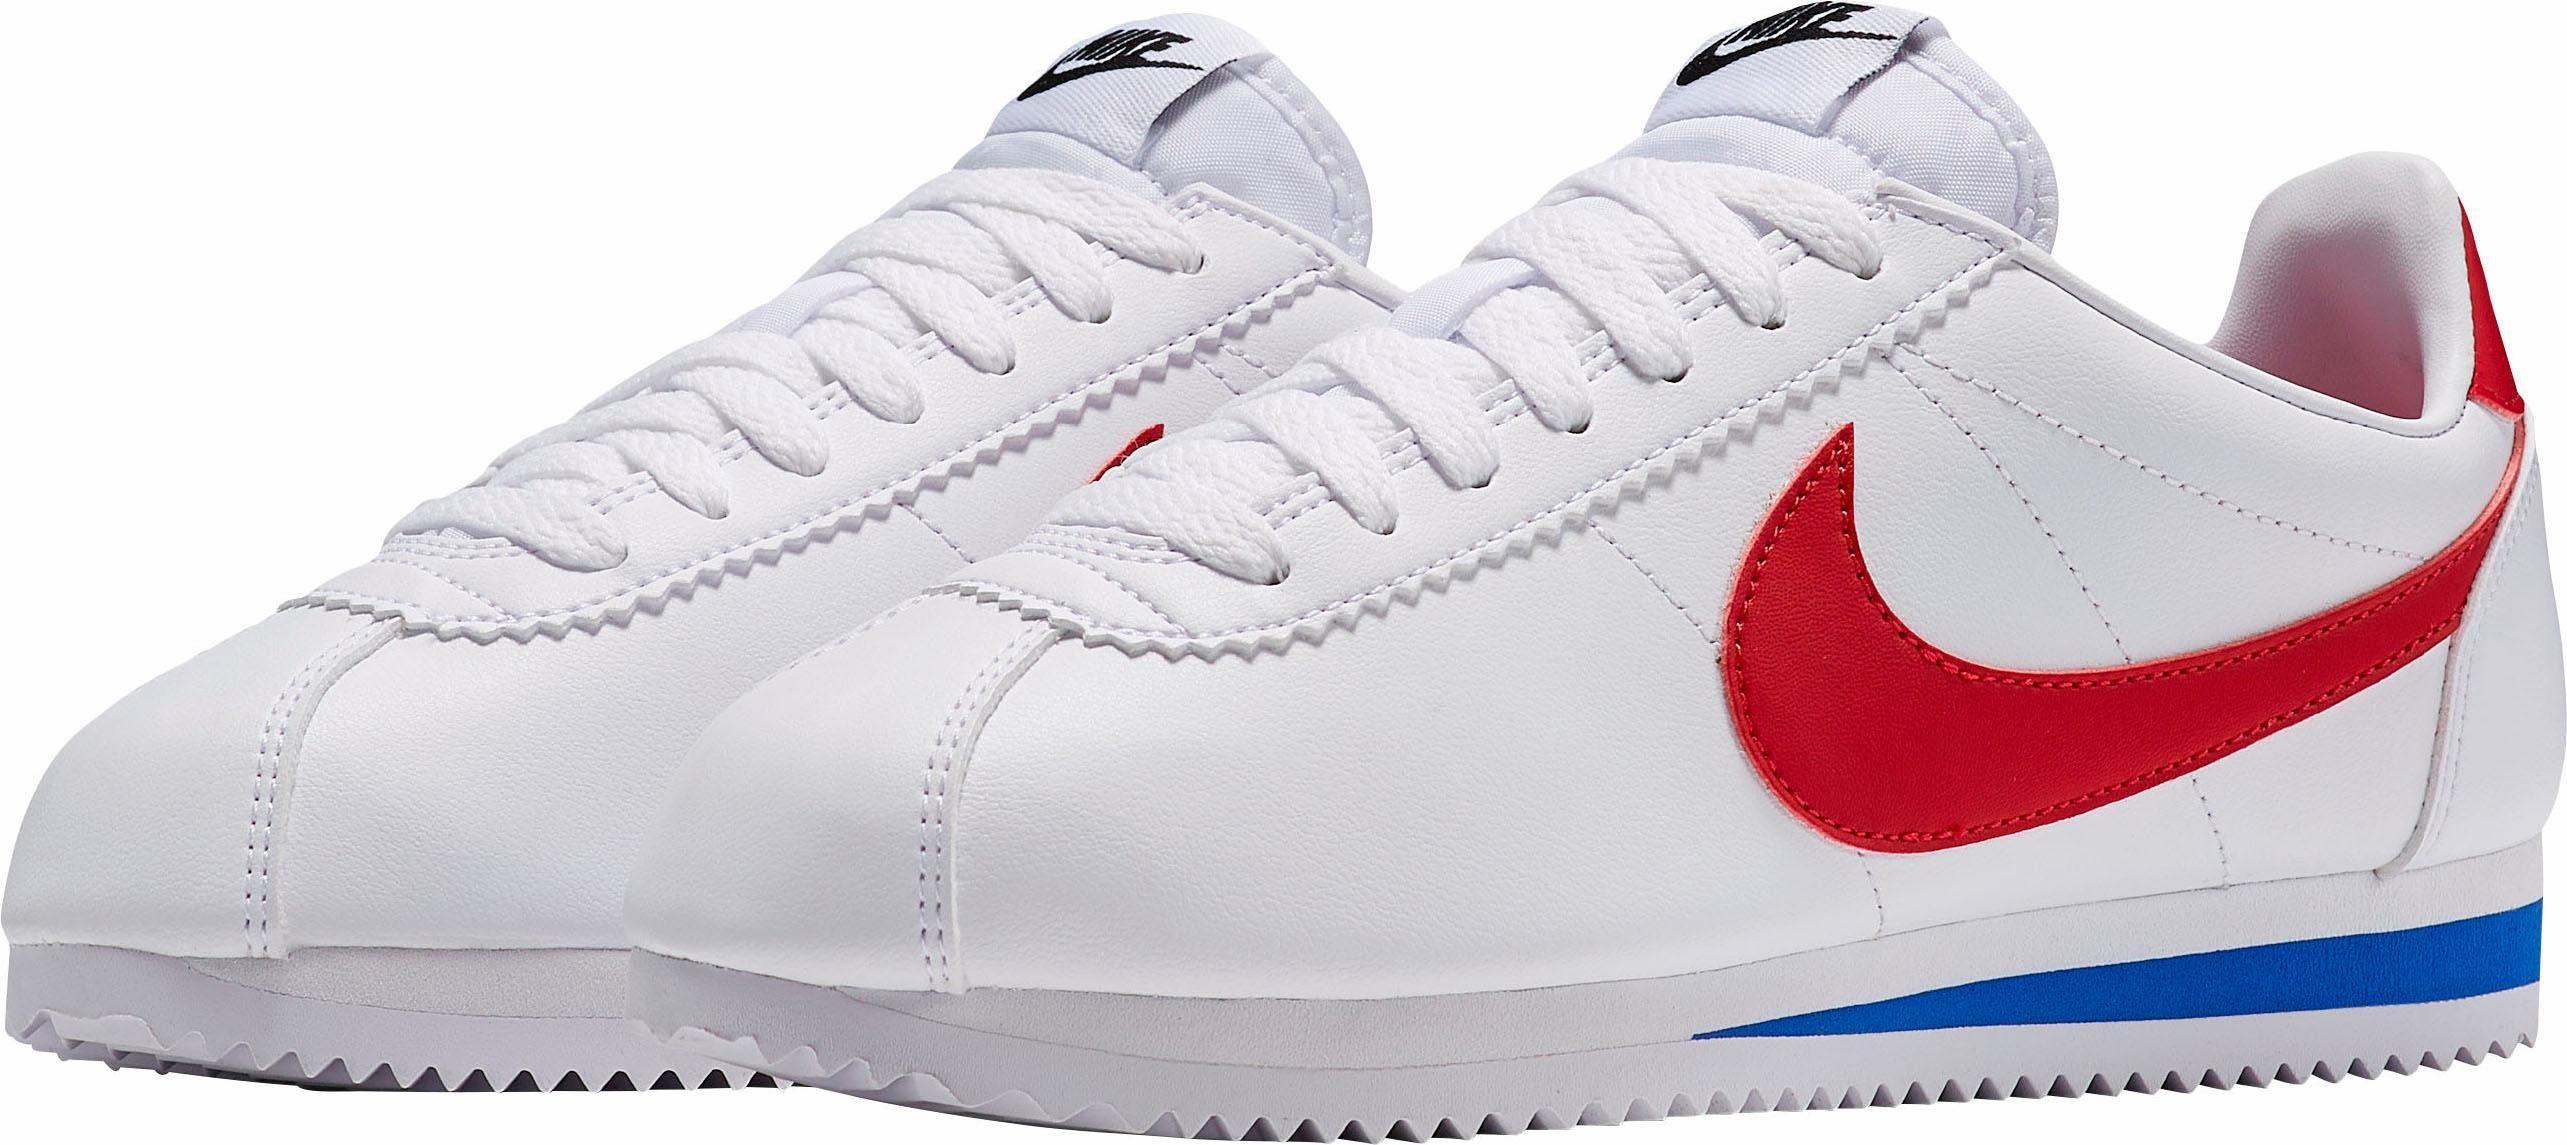 Nike Air Max 95 Schoenen   Nike Wmns Air Max 95 SE WitRood